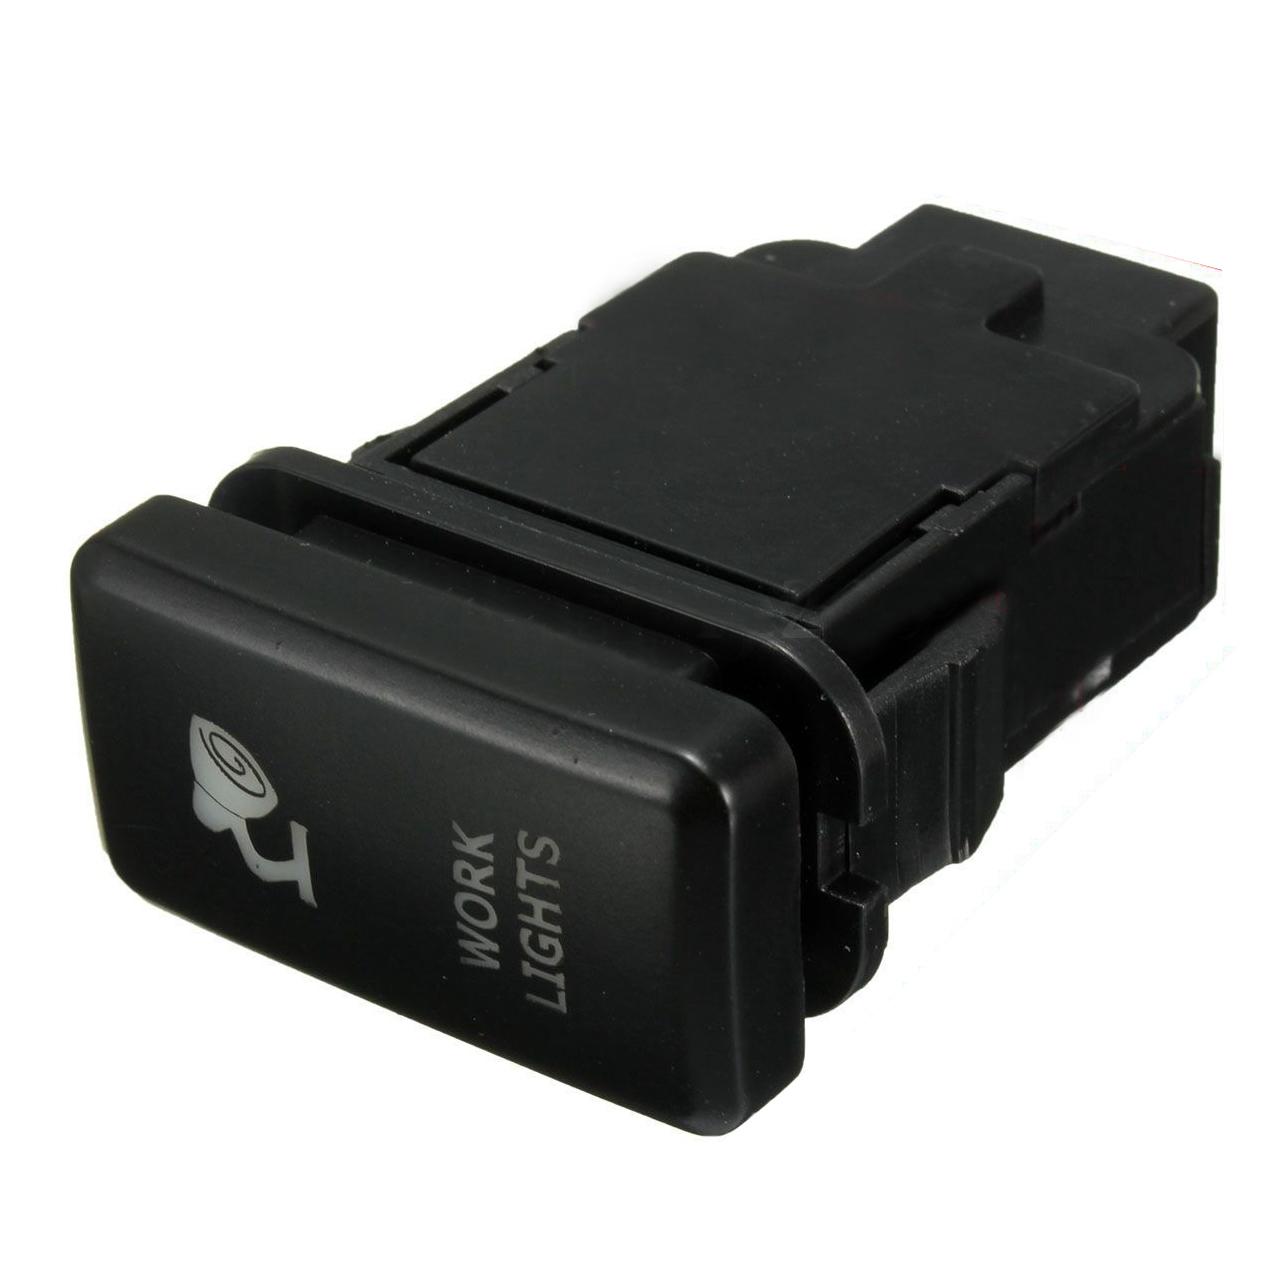 062266-2  Switch Fog Light Wiring Diagram Fj Cruiser on